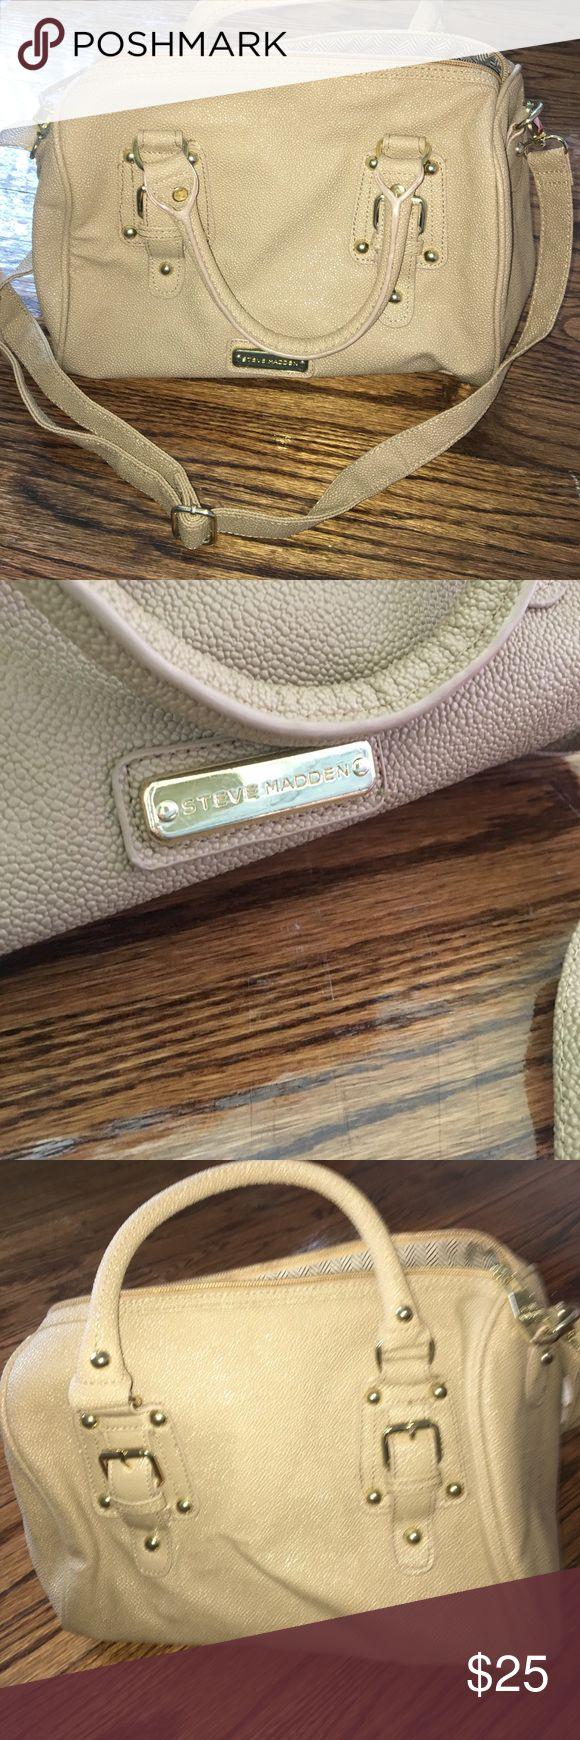 Steve Madden Purse Cream gold Steve Madden Bags